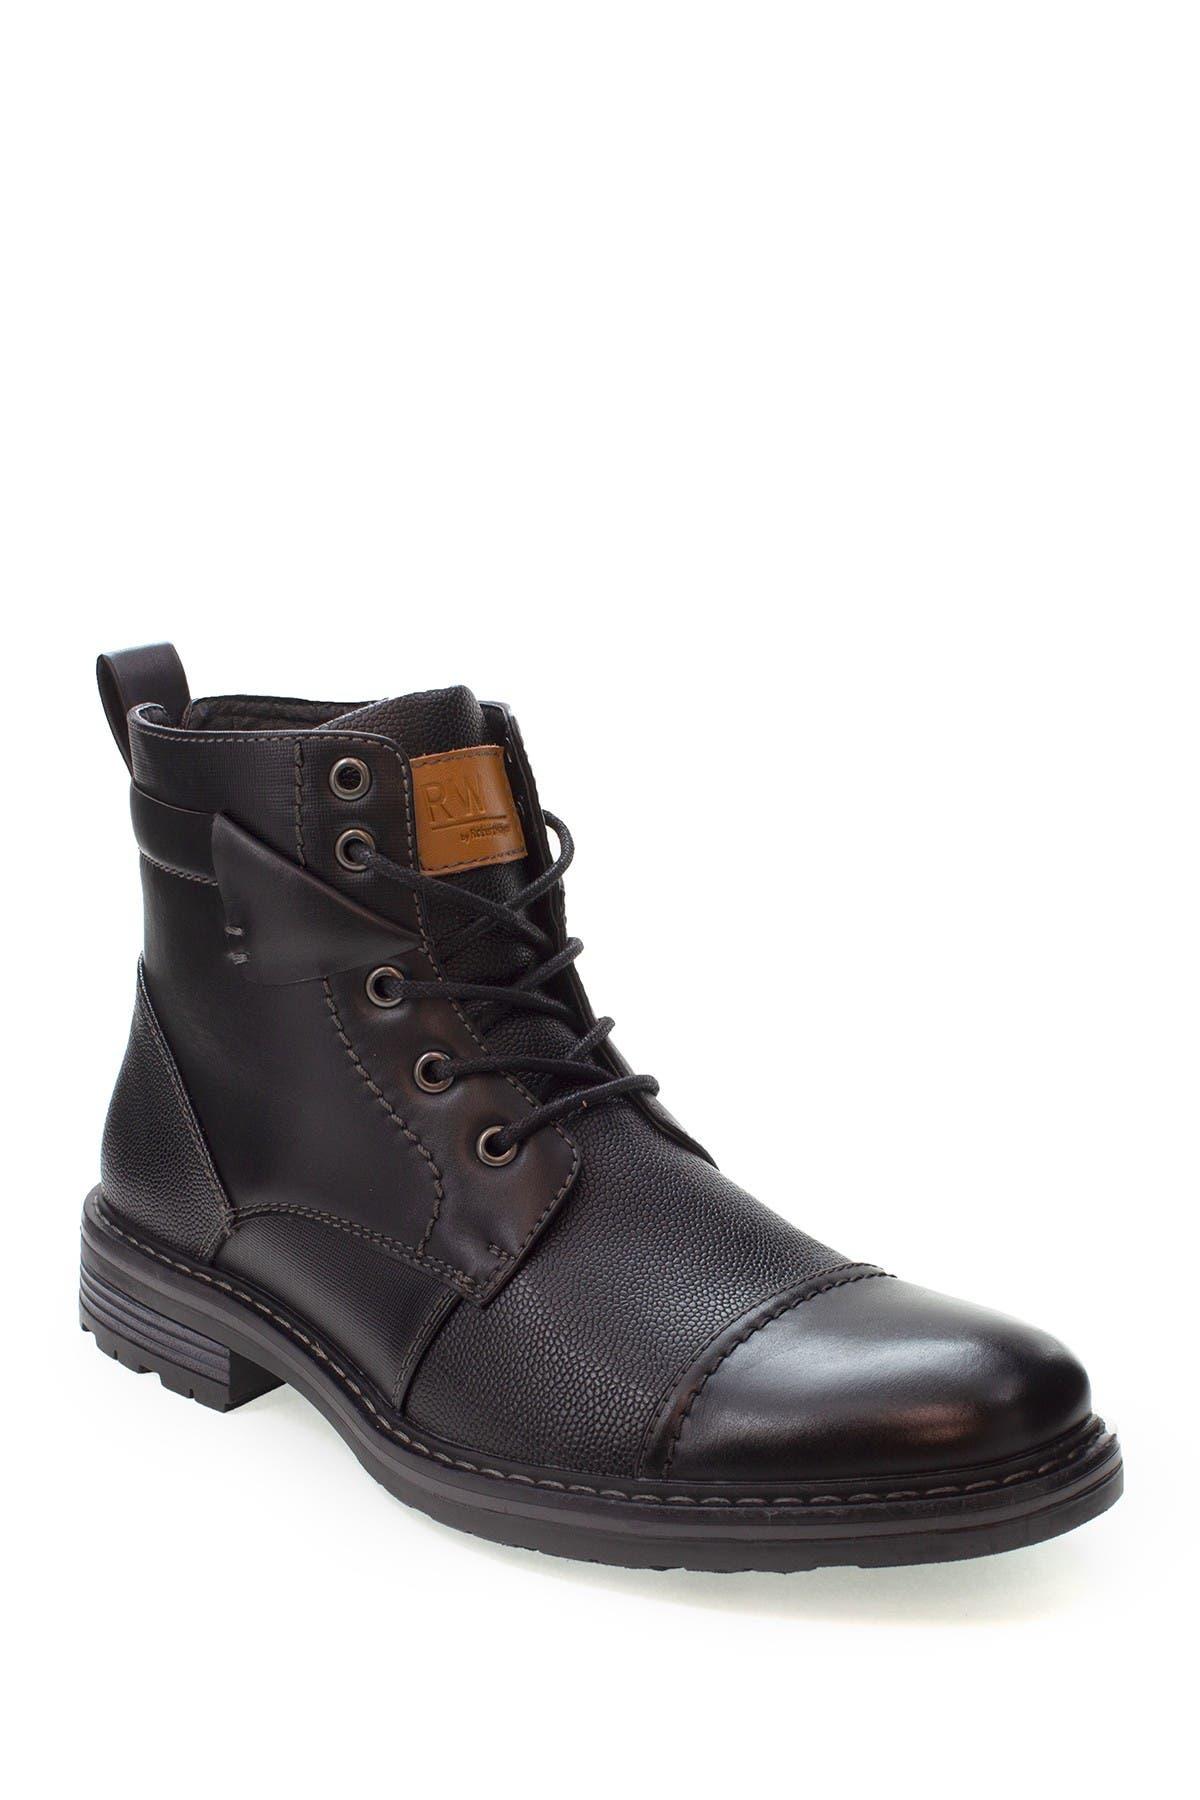 Robert Wayne | Jefferson Boot